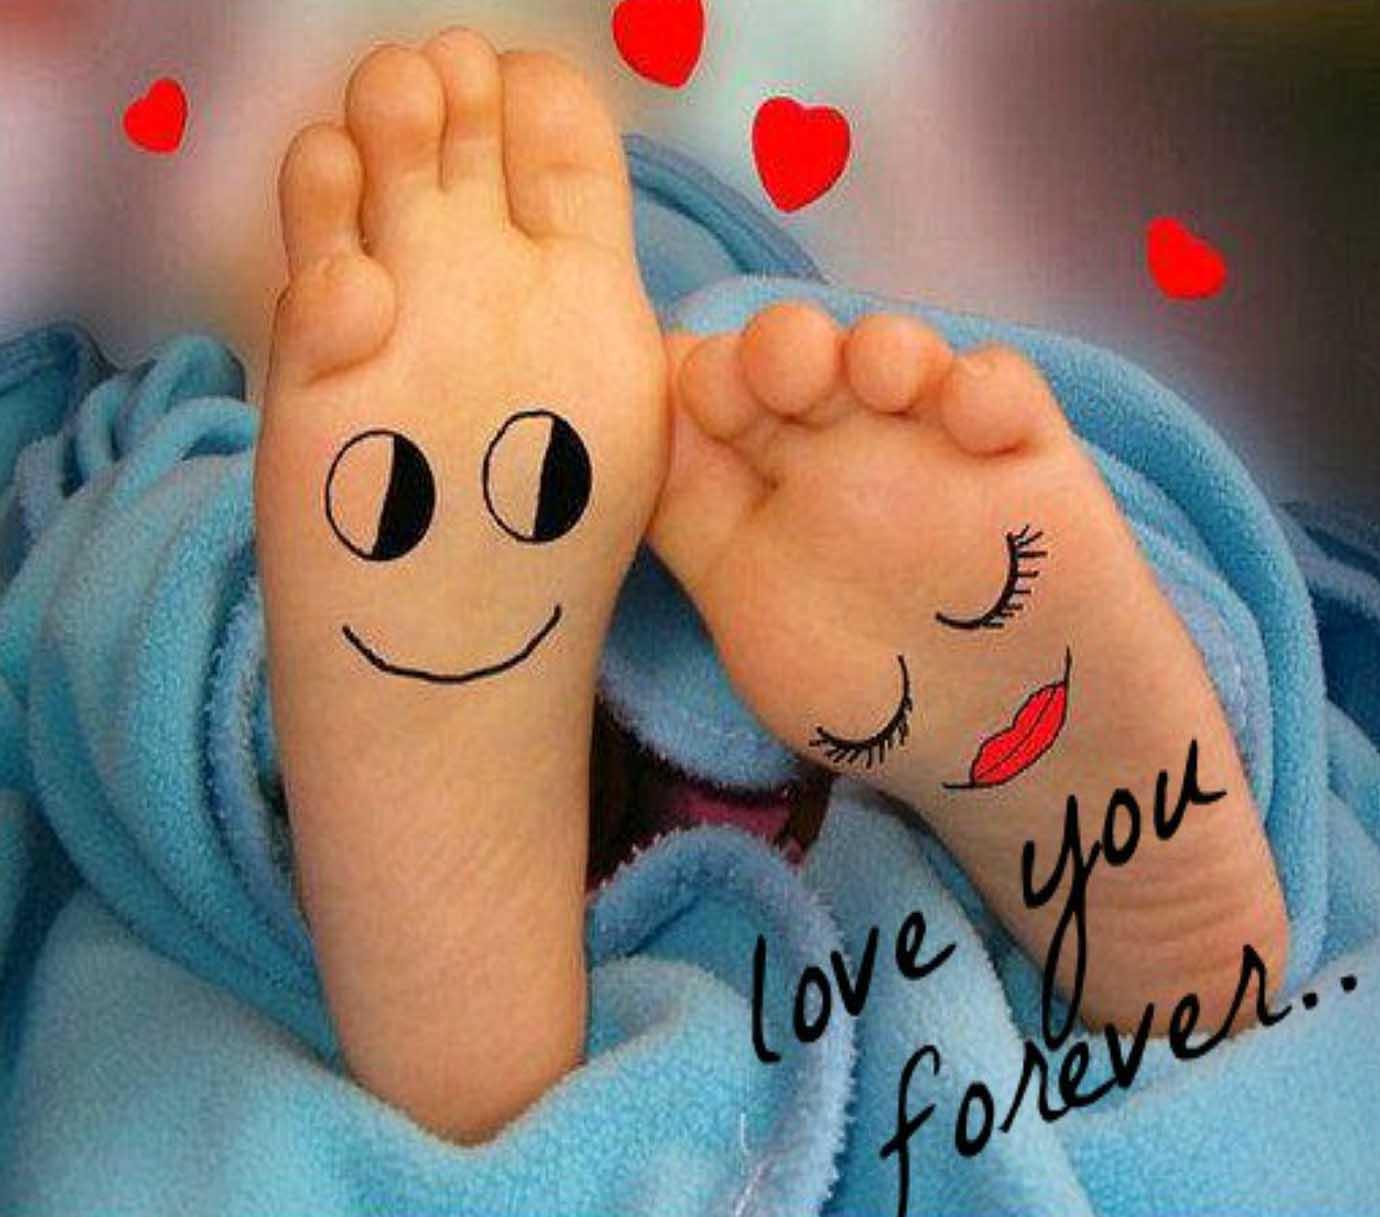 Wallpaper Love Heart Free Download 14198 Hd Wallpapers In N